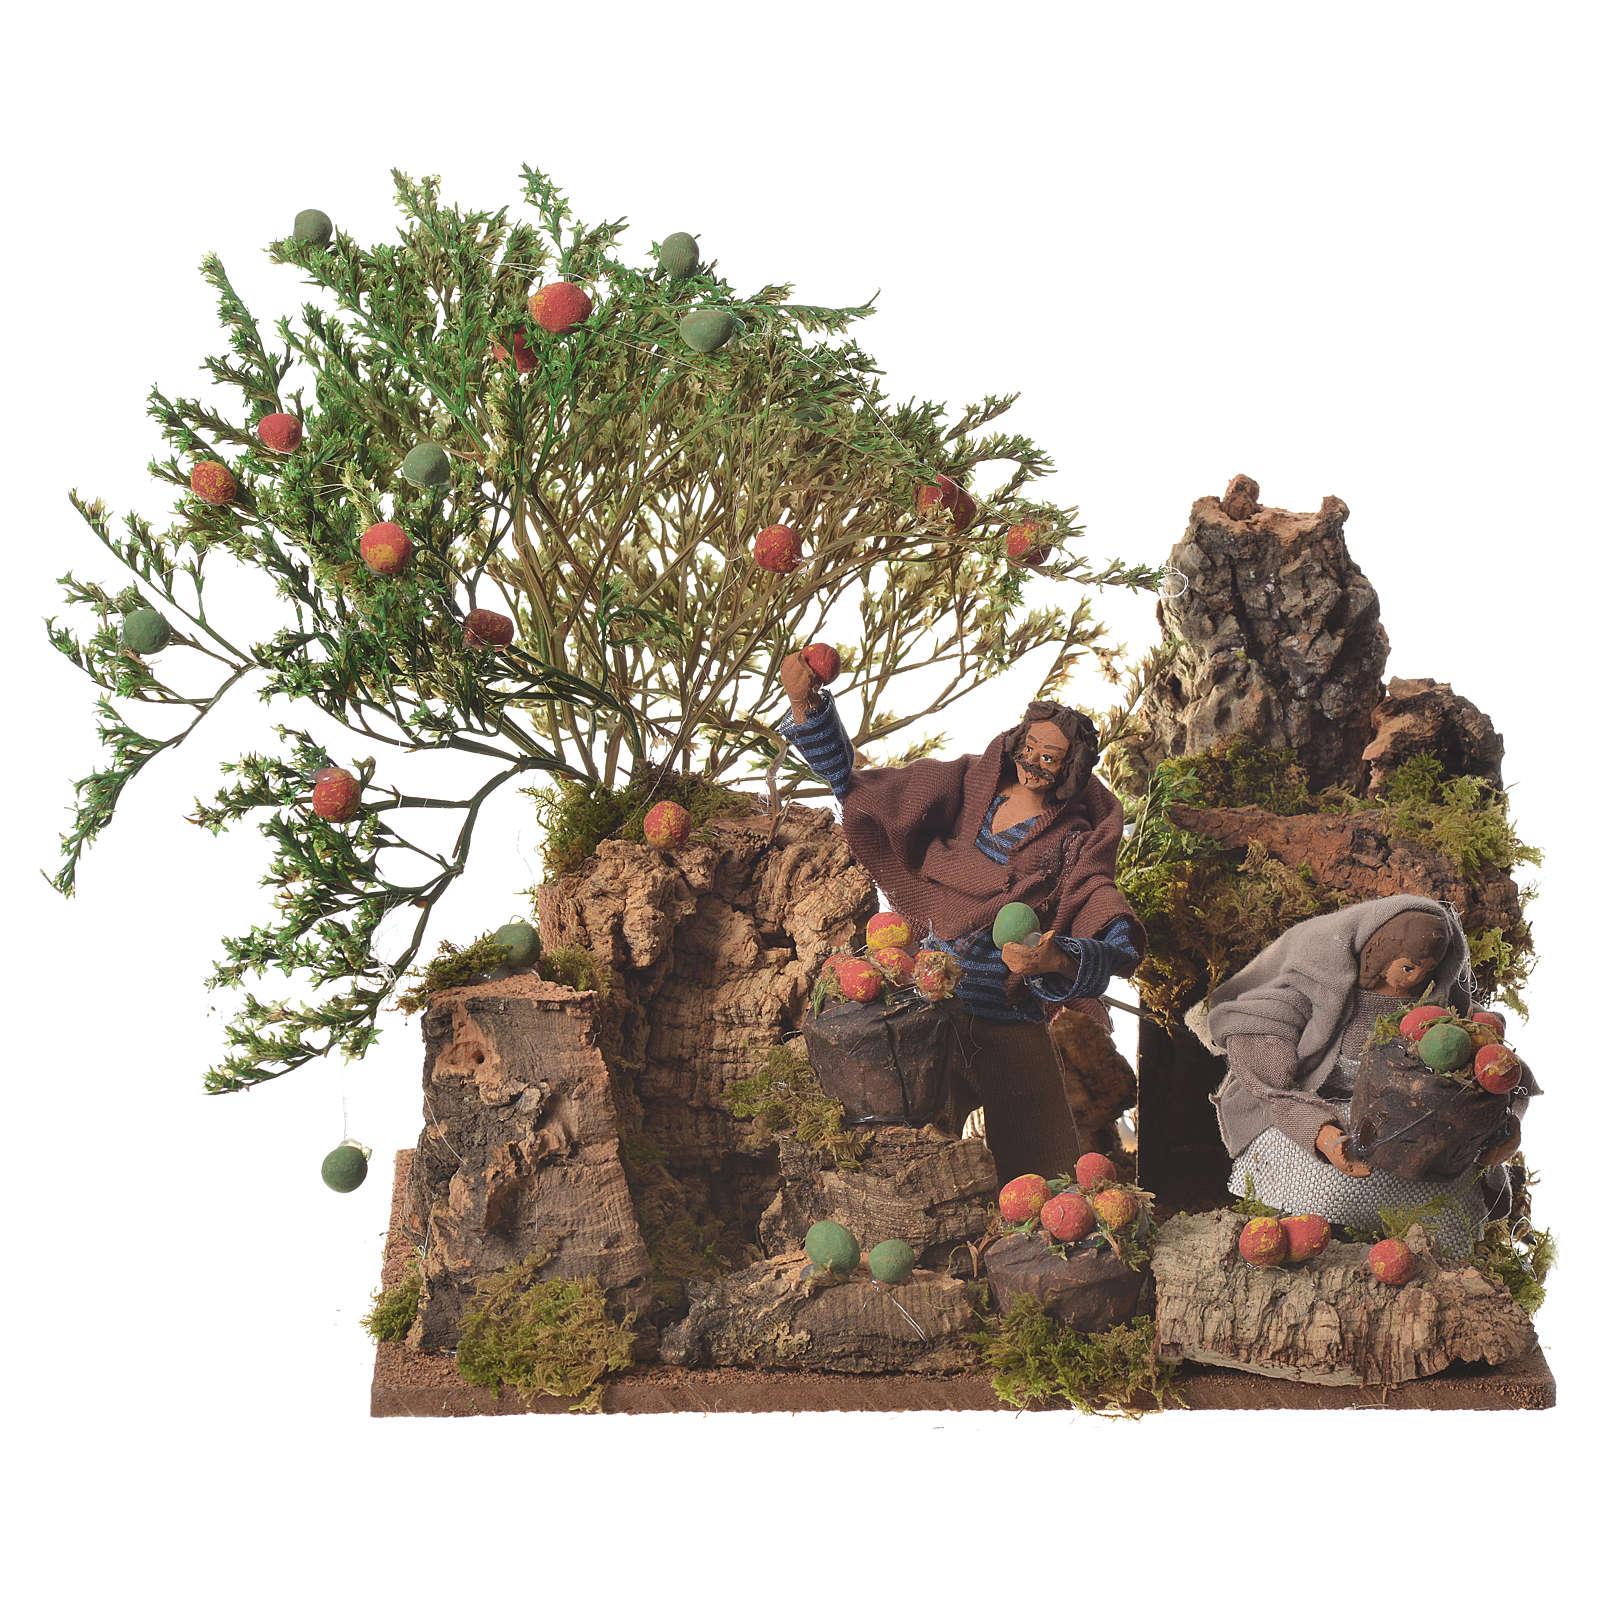 Man picking apples, 12cm animated nativity 3